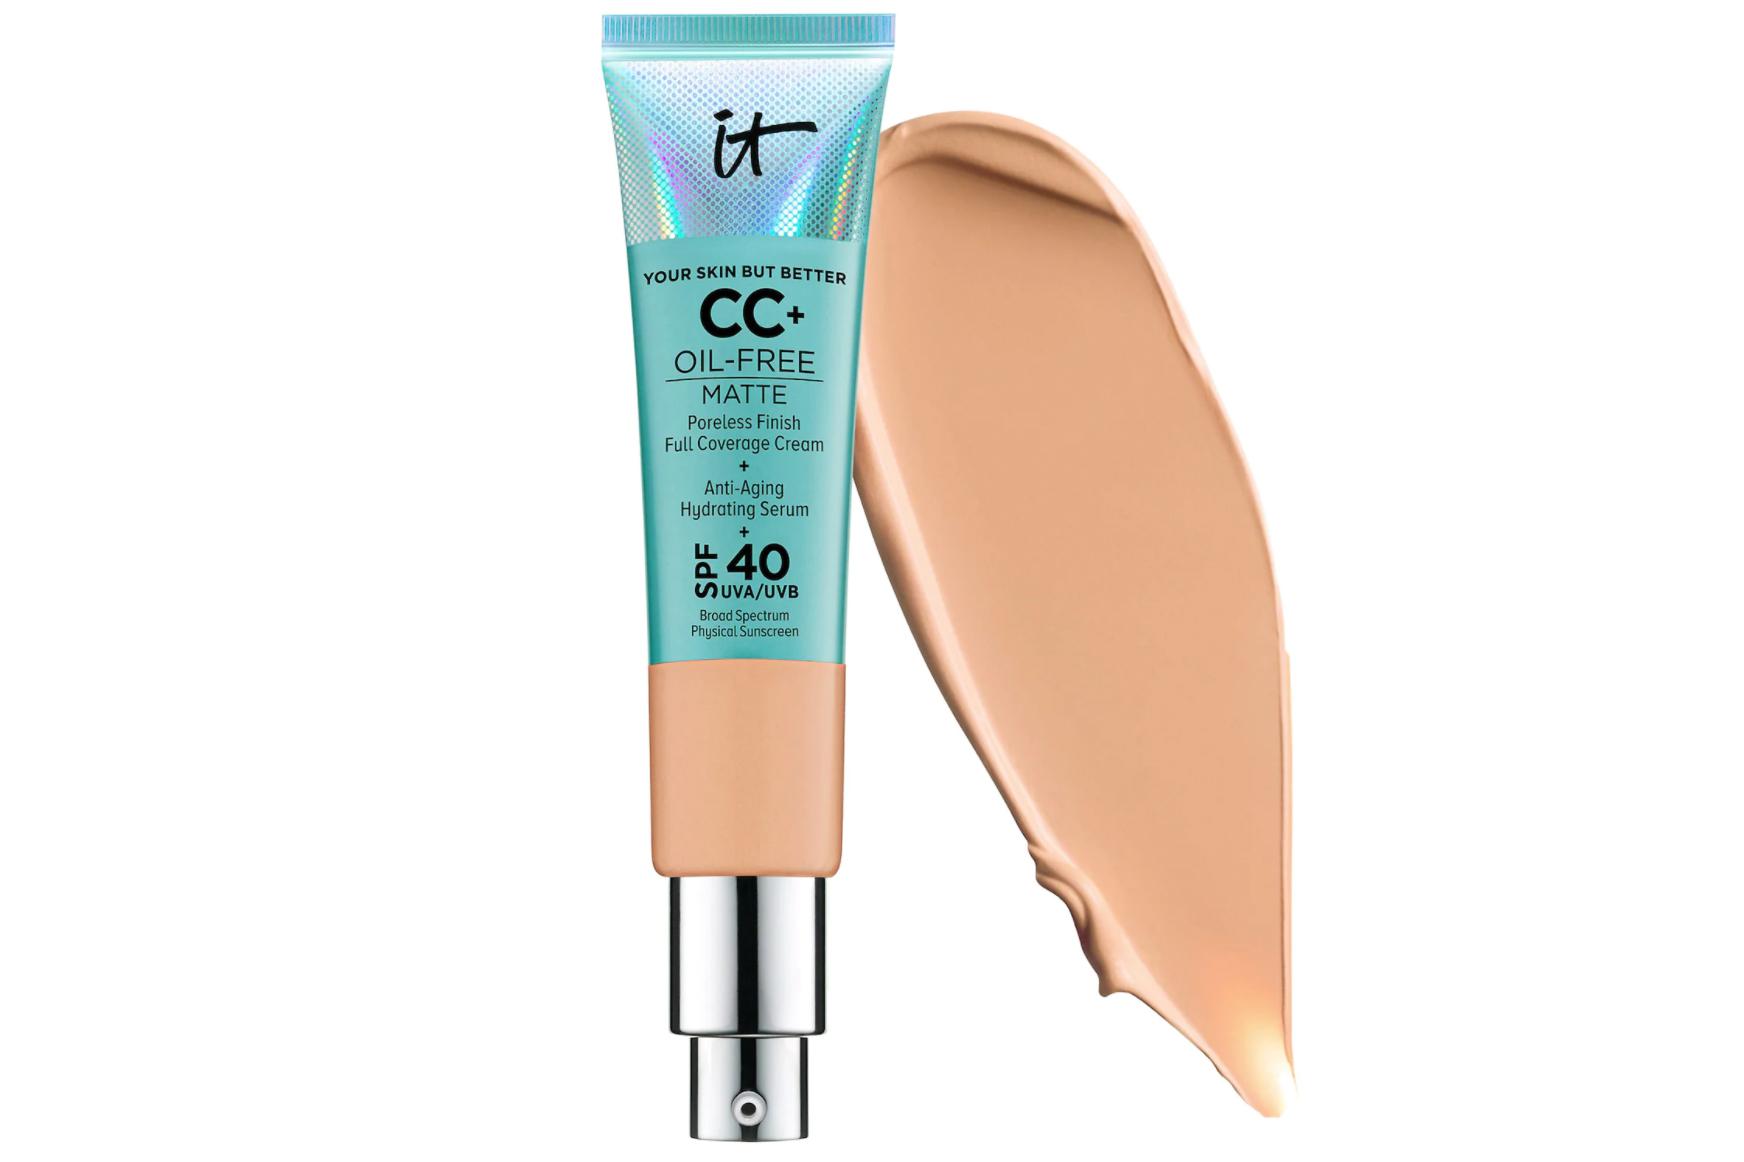 sweat-proof makeup it cosmetics cc cream